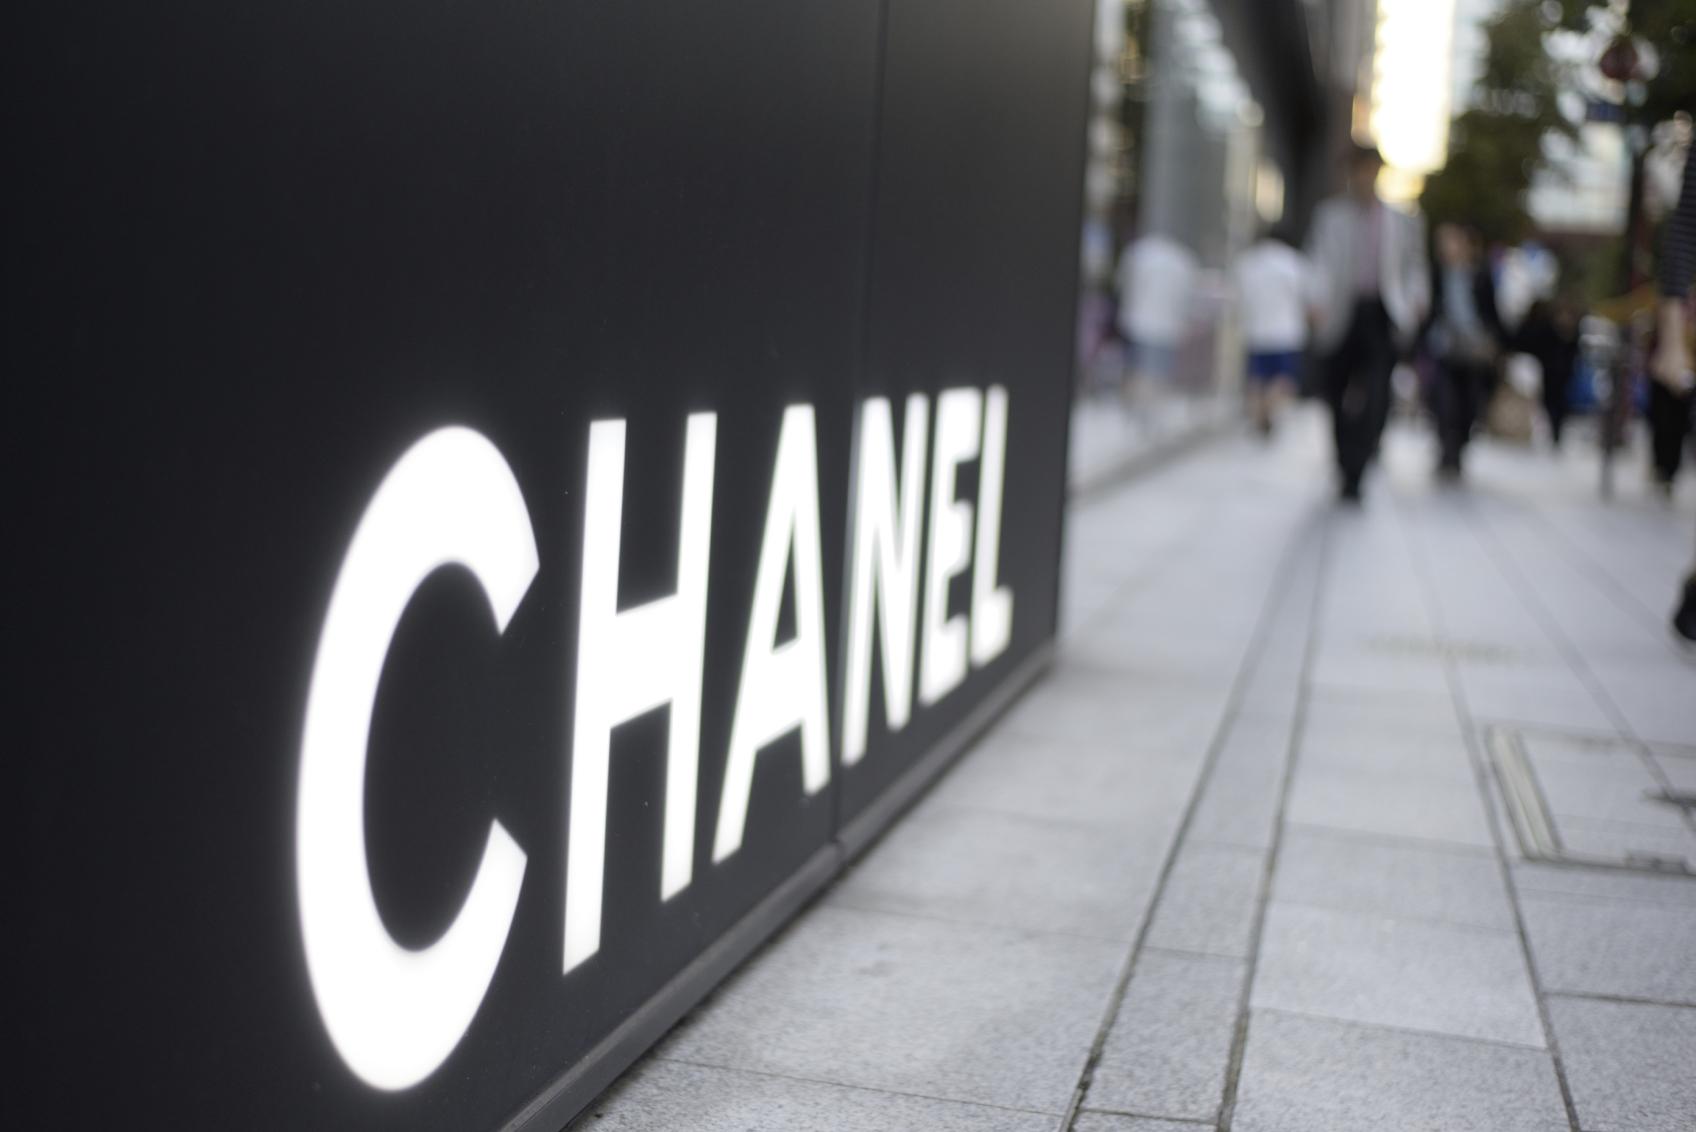 Xerox Ad What Chanel and Kleene...